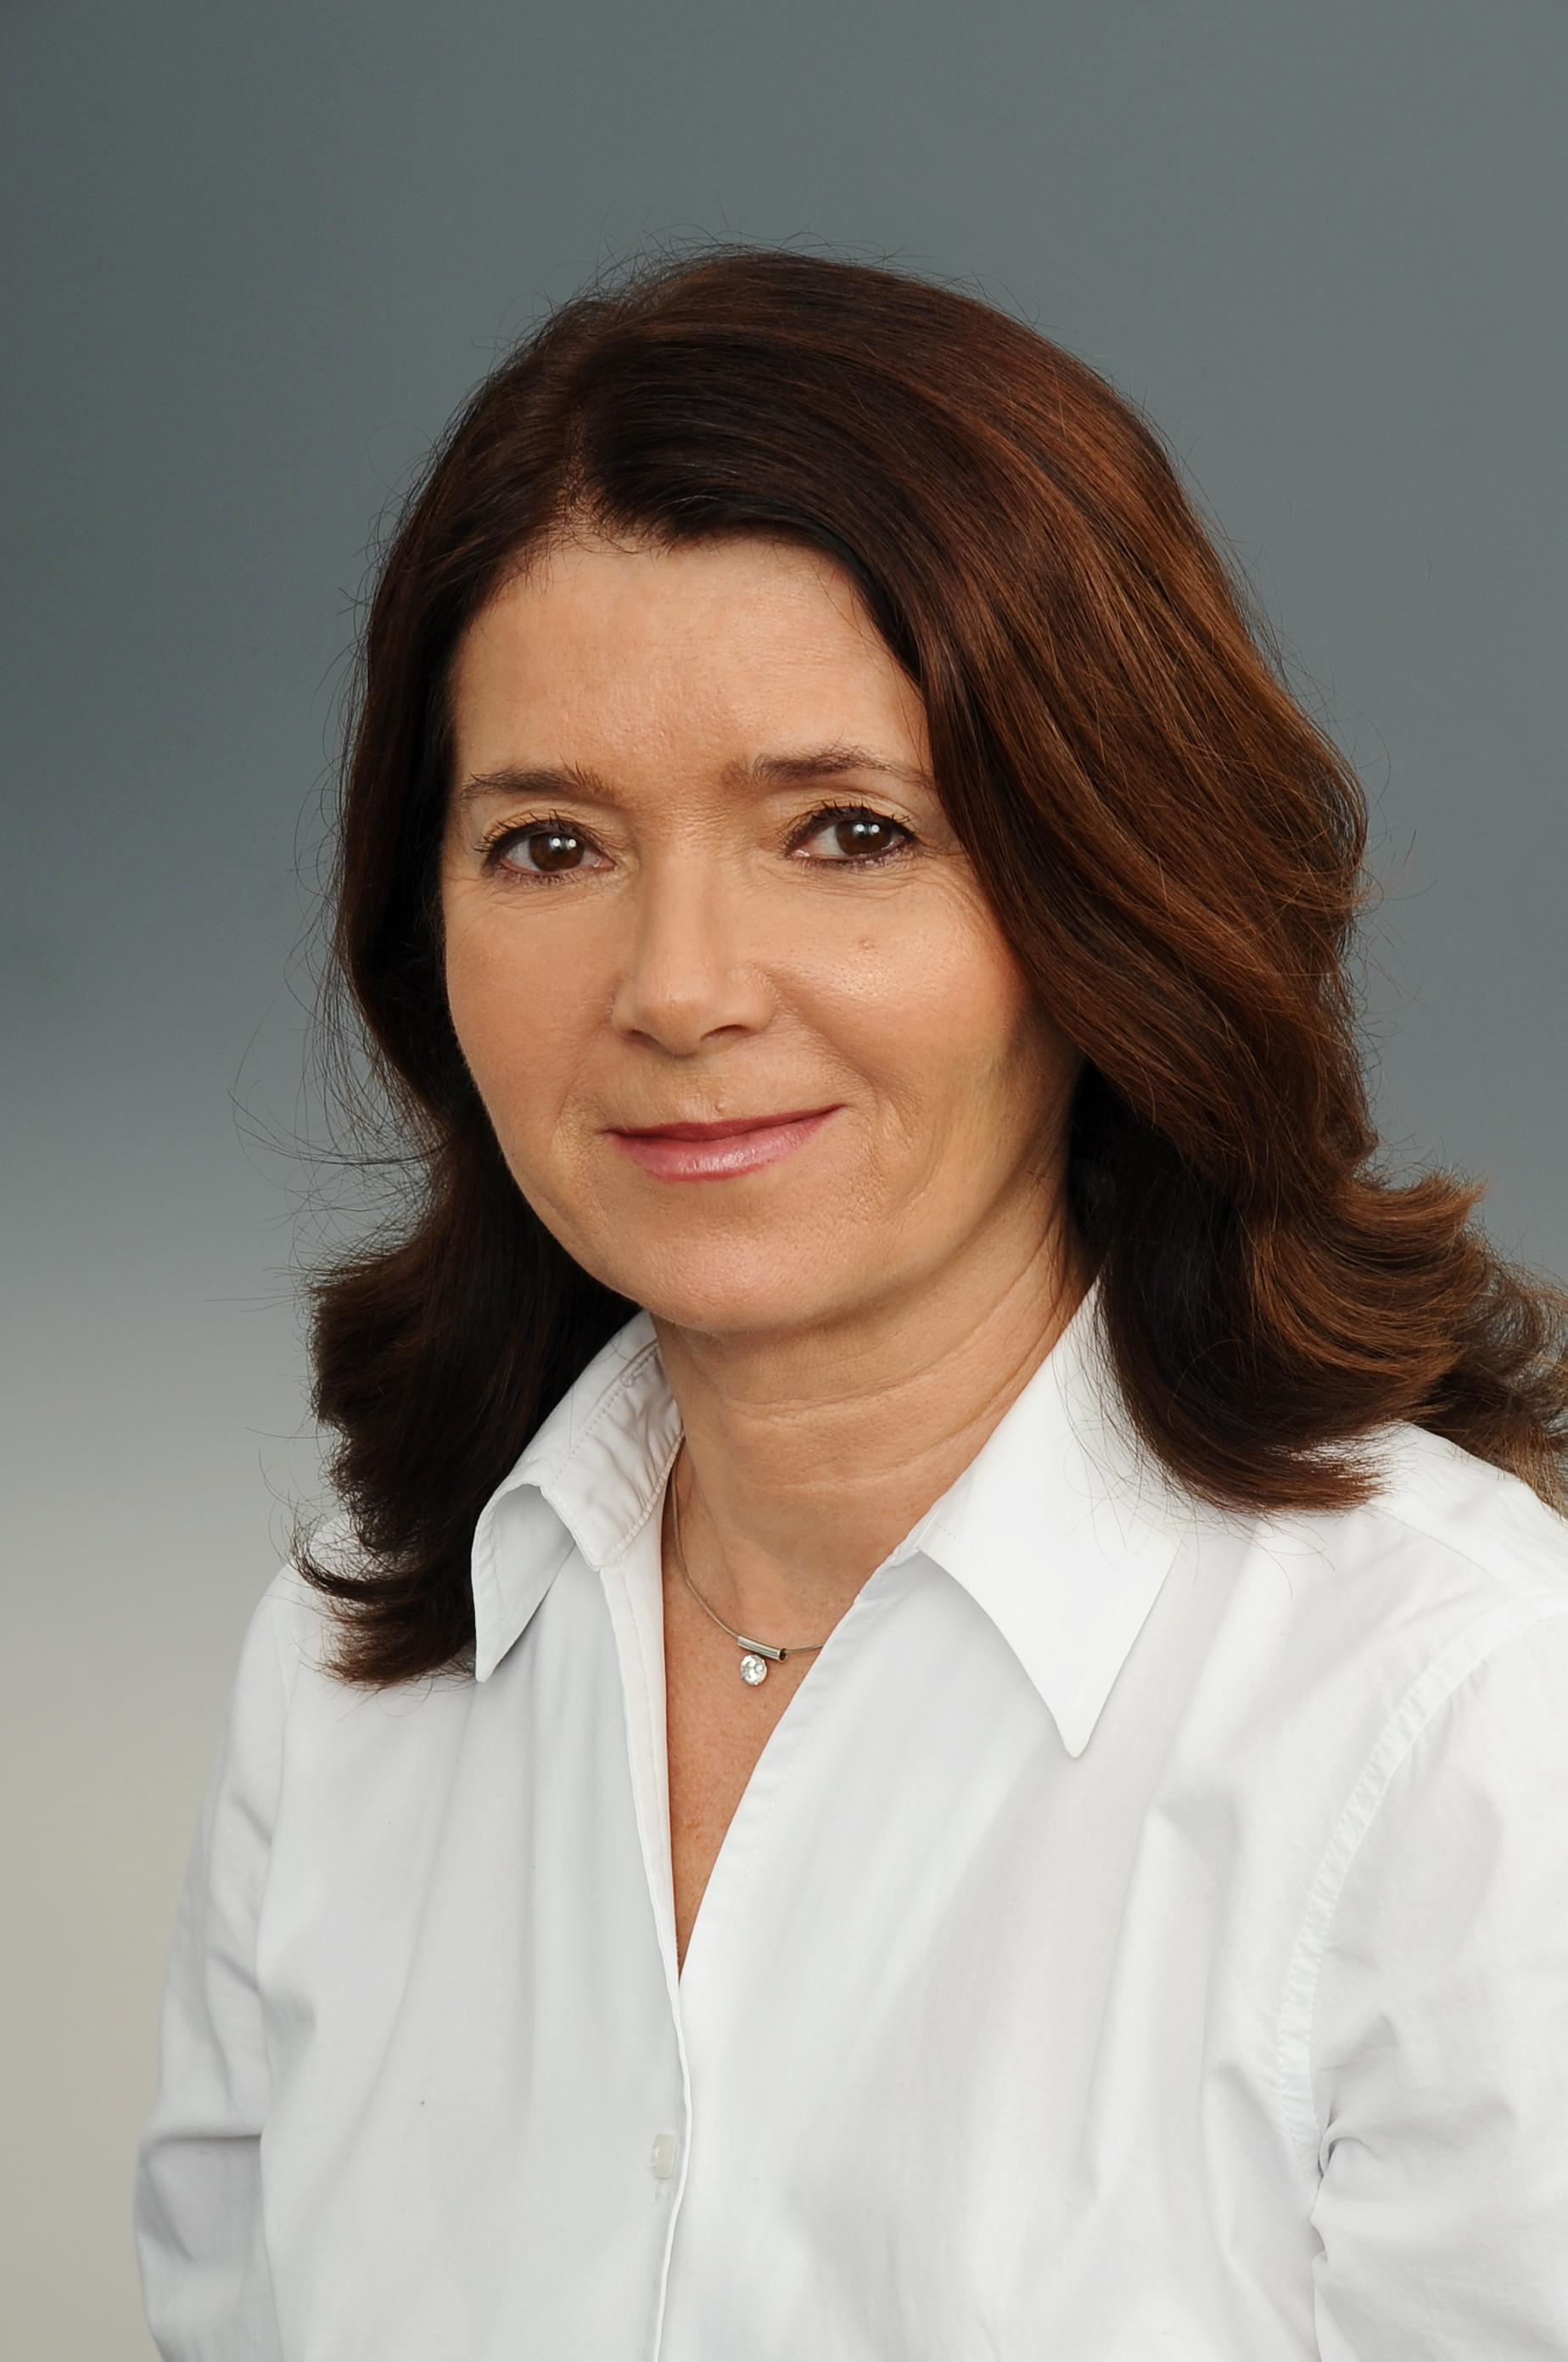 dr hab. n. med. Aneta Krogulska